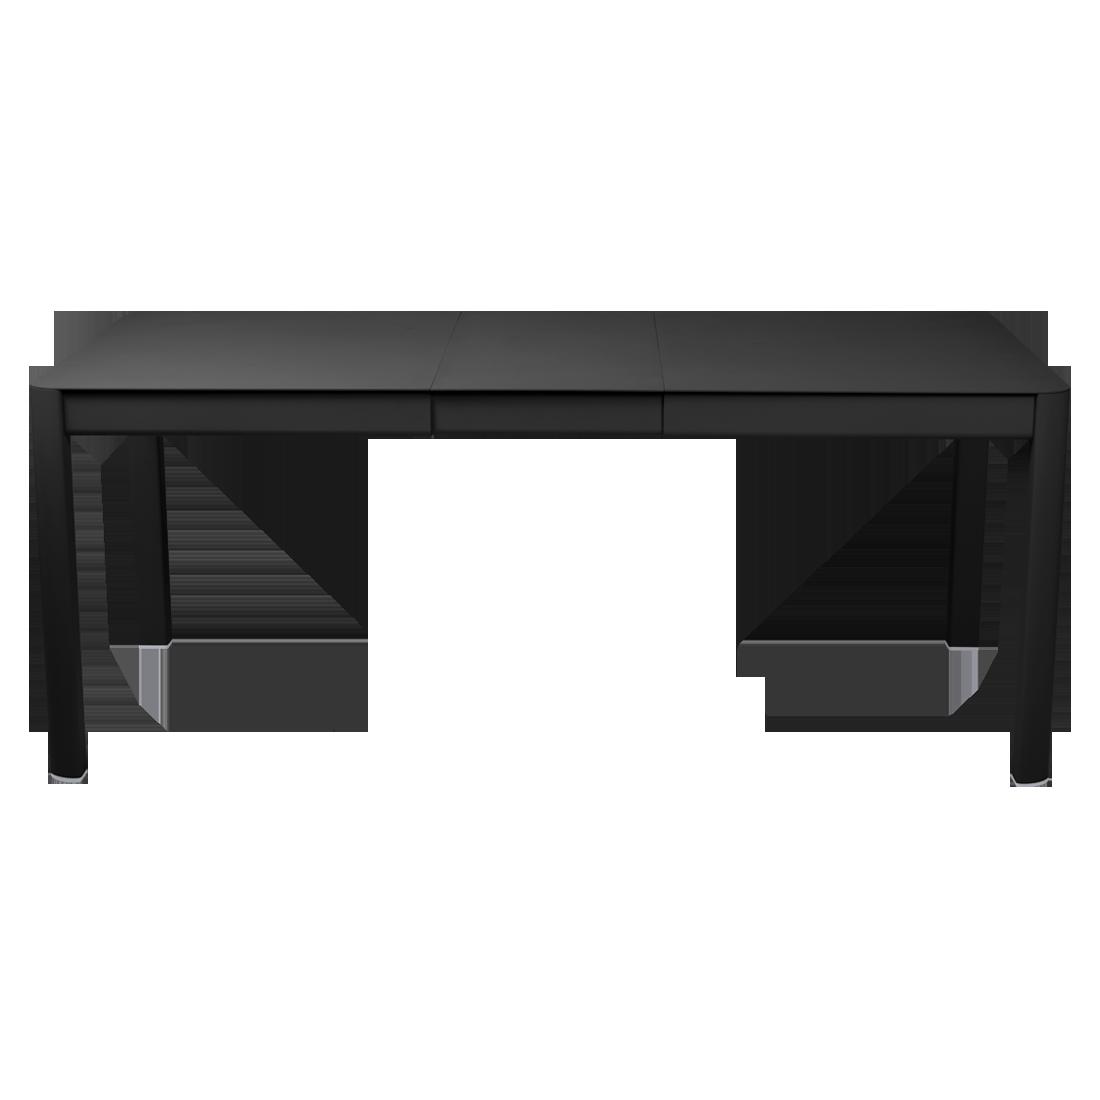 table de jardin noir, table metal allonge, table metal a rallonge, table metal rectangulaire, table fermob allonge